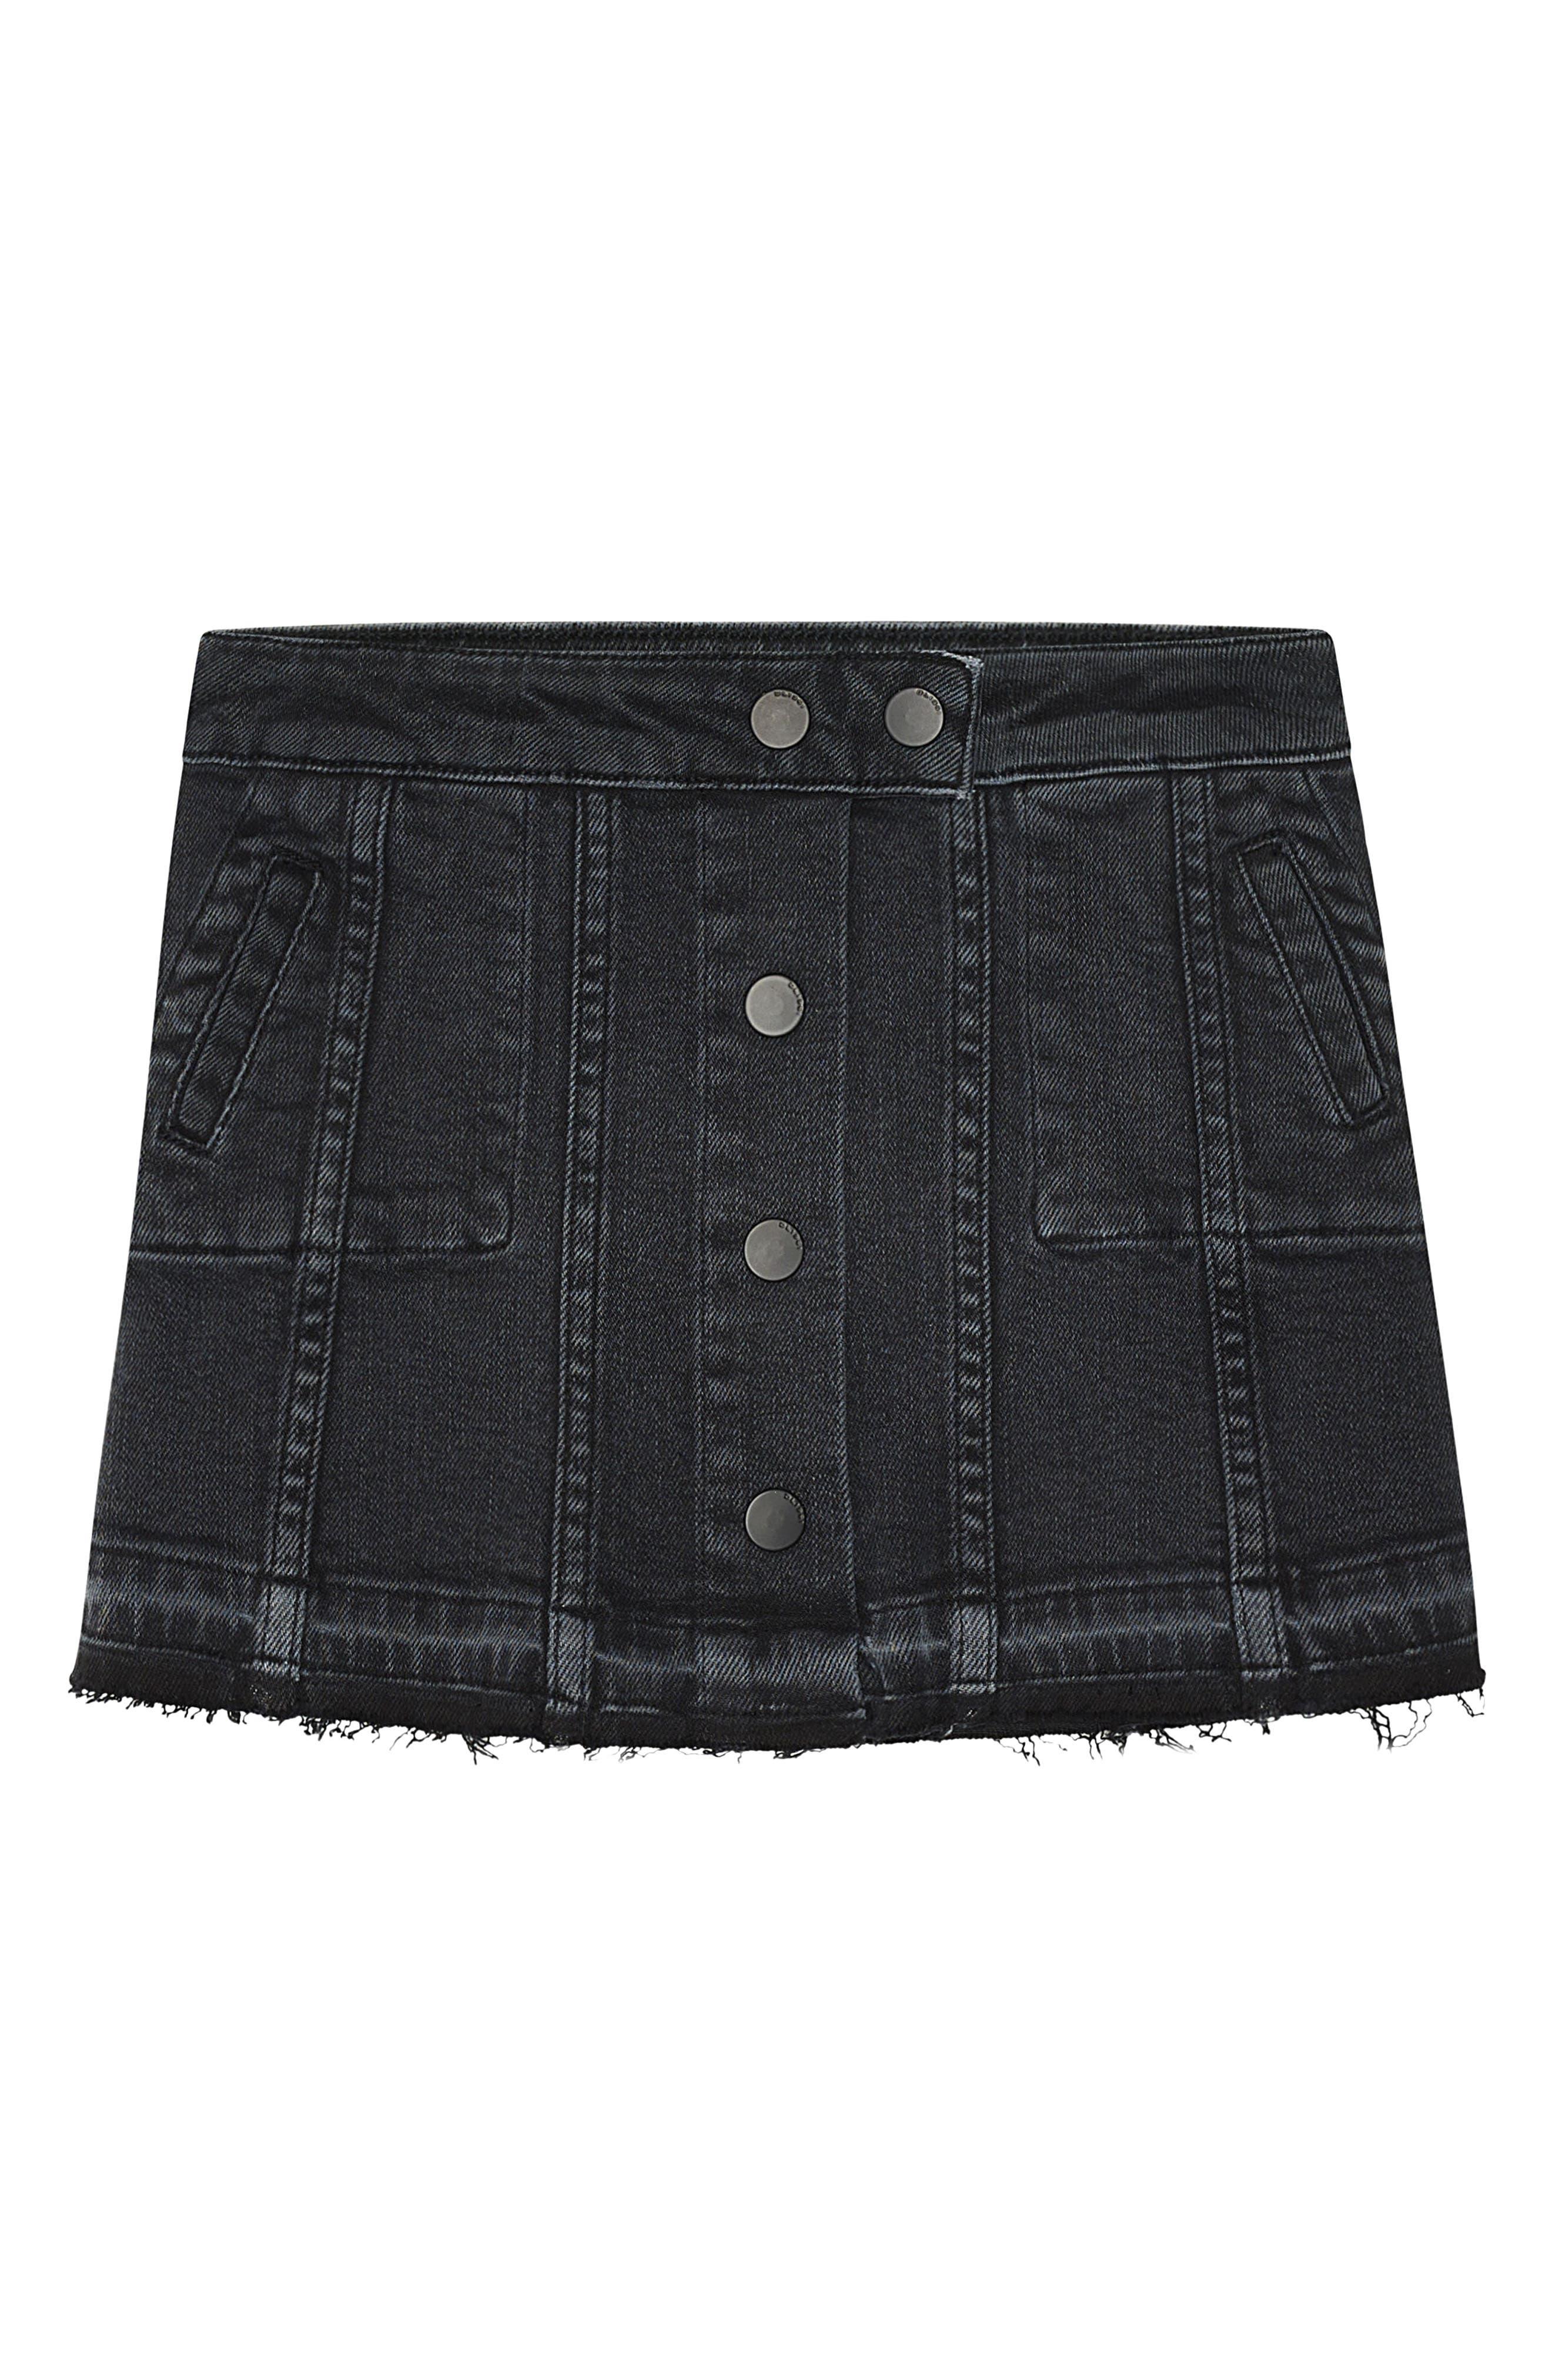 Main Image - DL1961 Jenny Cutoff Denim Skirt (Big Girls)